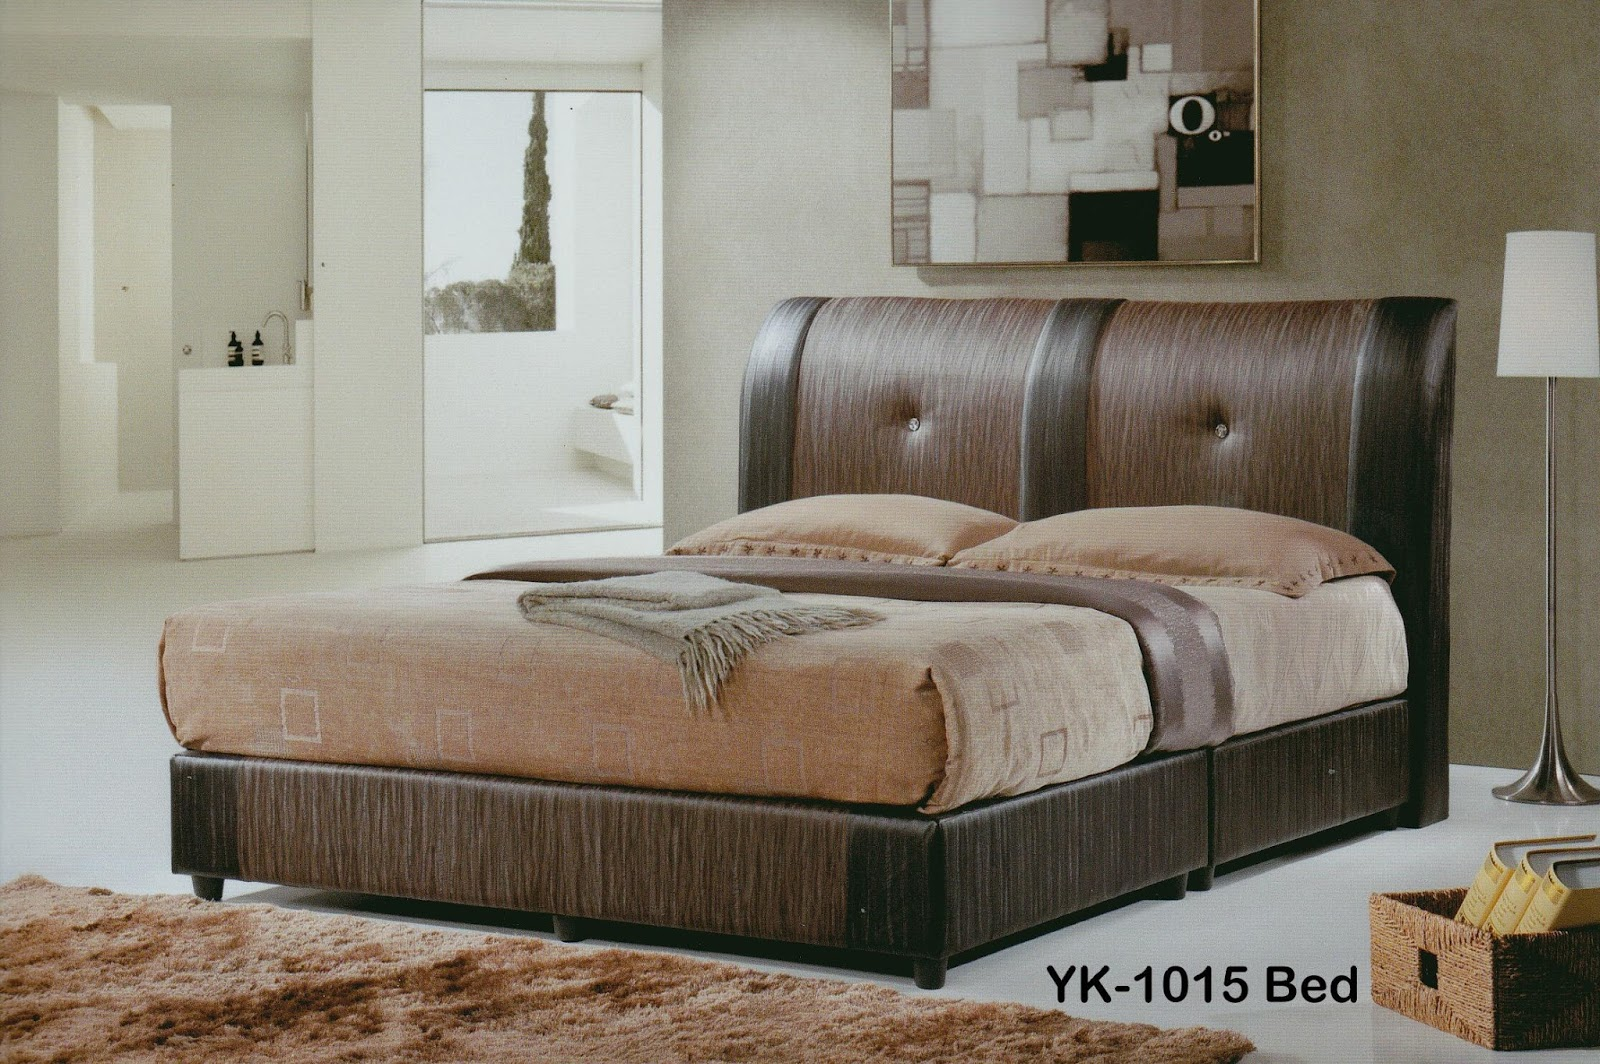 Sg tan queen size divan bed chocolate color lazada for Divan queen size bed